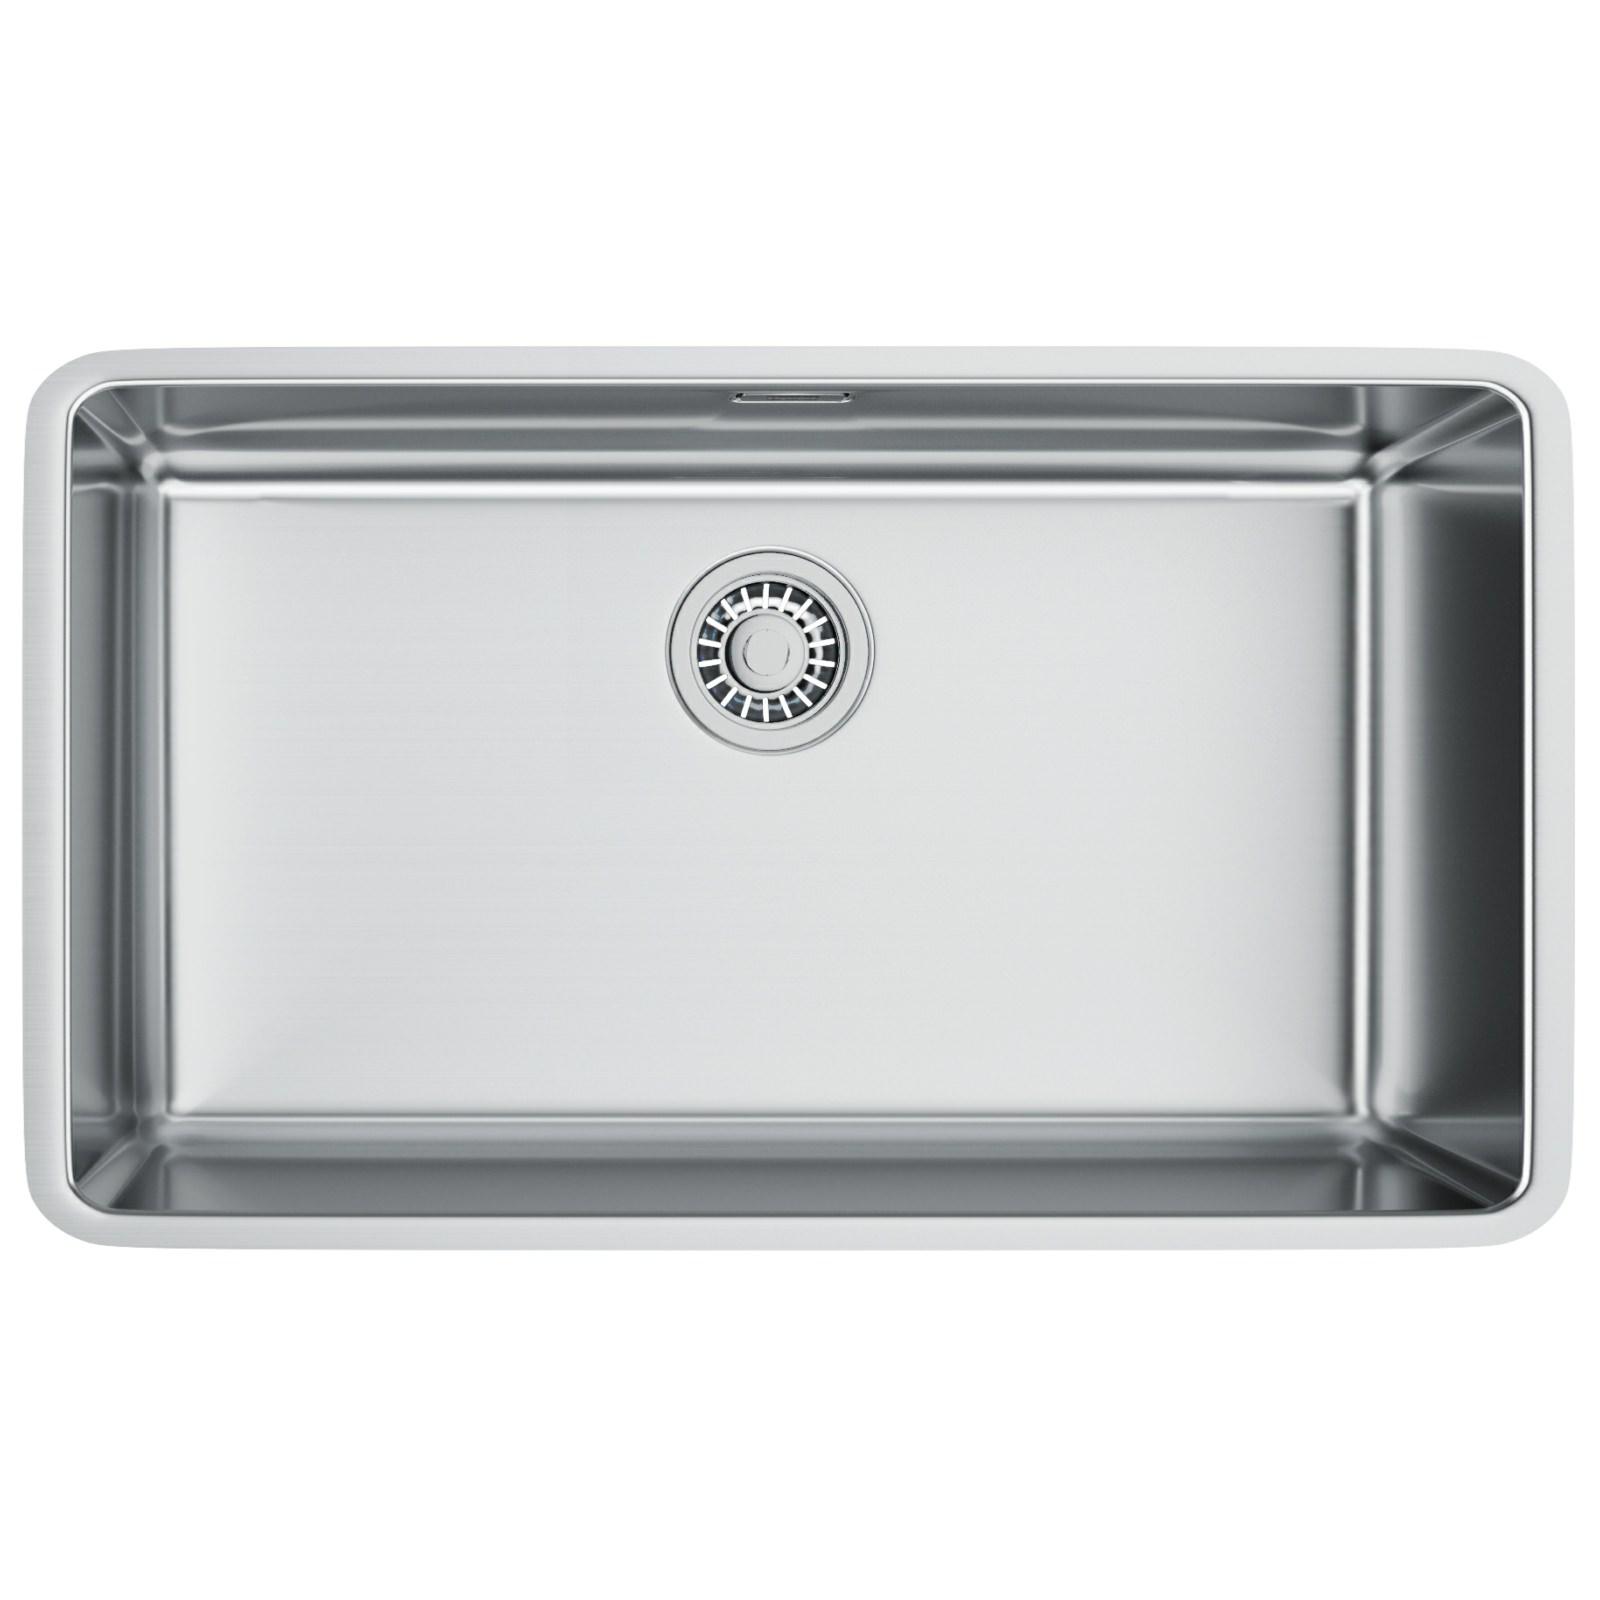 franke kitchen sinks counter height table sets kubus kbx 110 70 stainless steel undermount